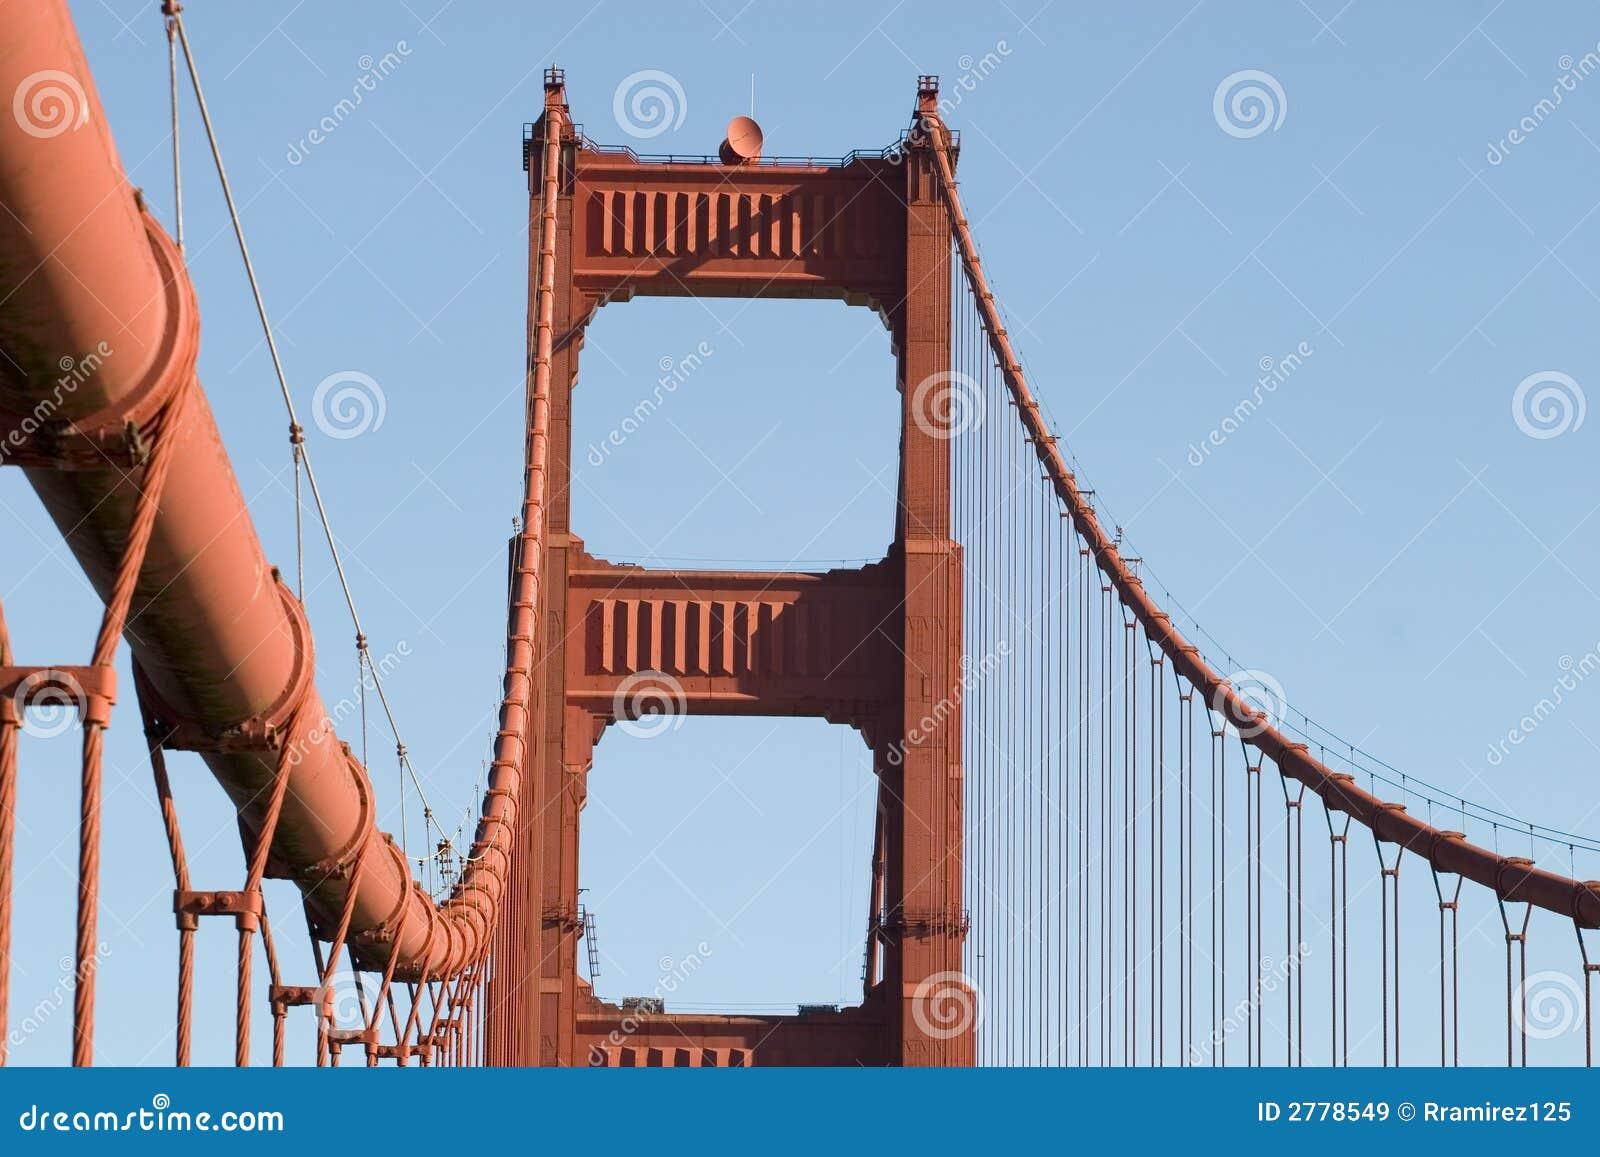 Close up tower Golden Gate